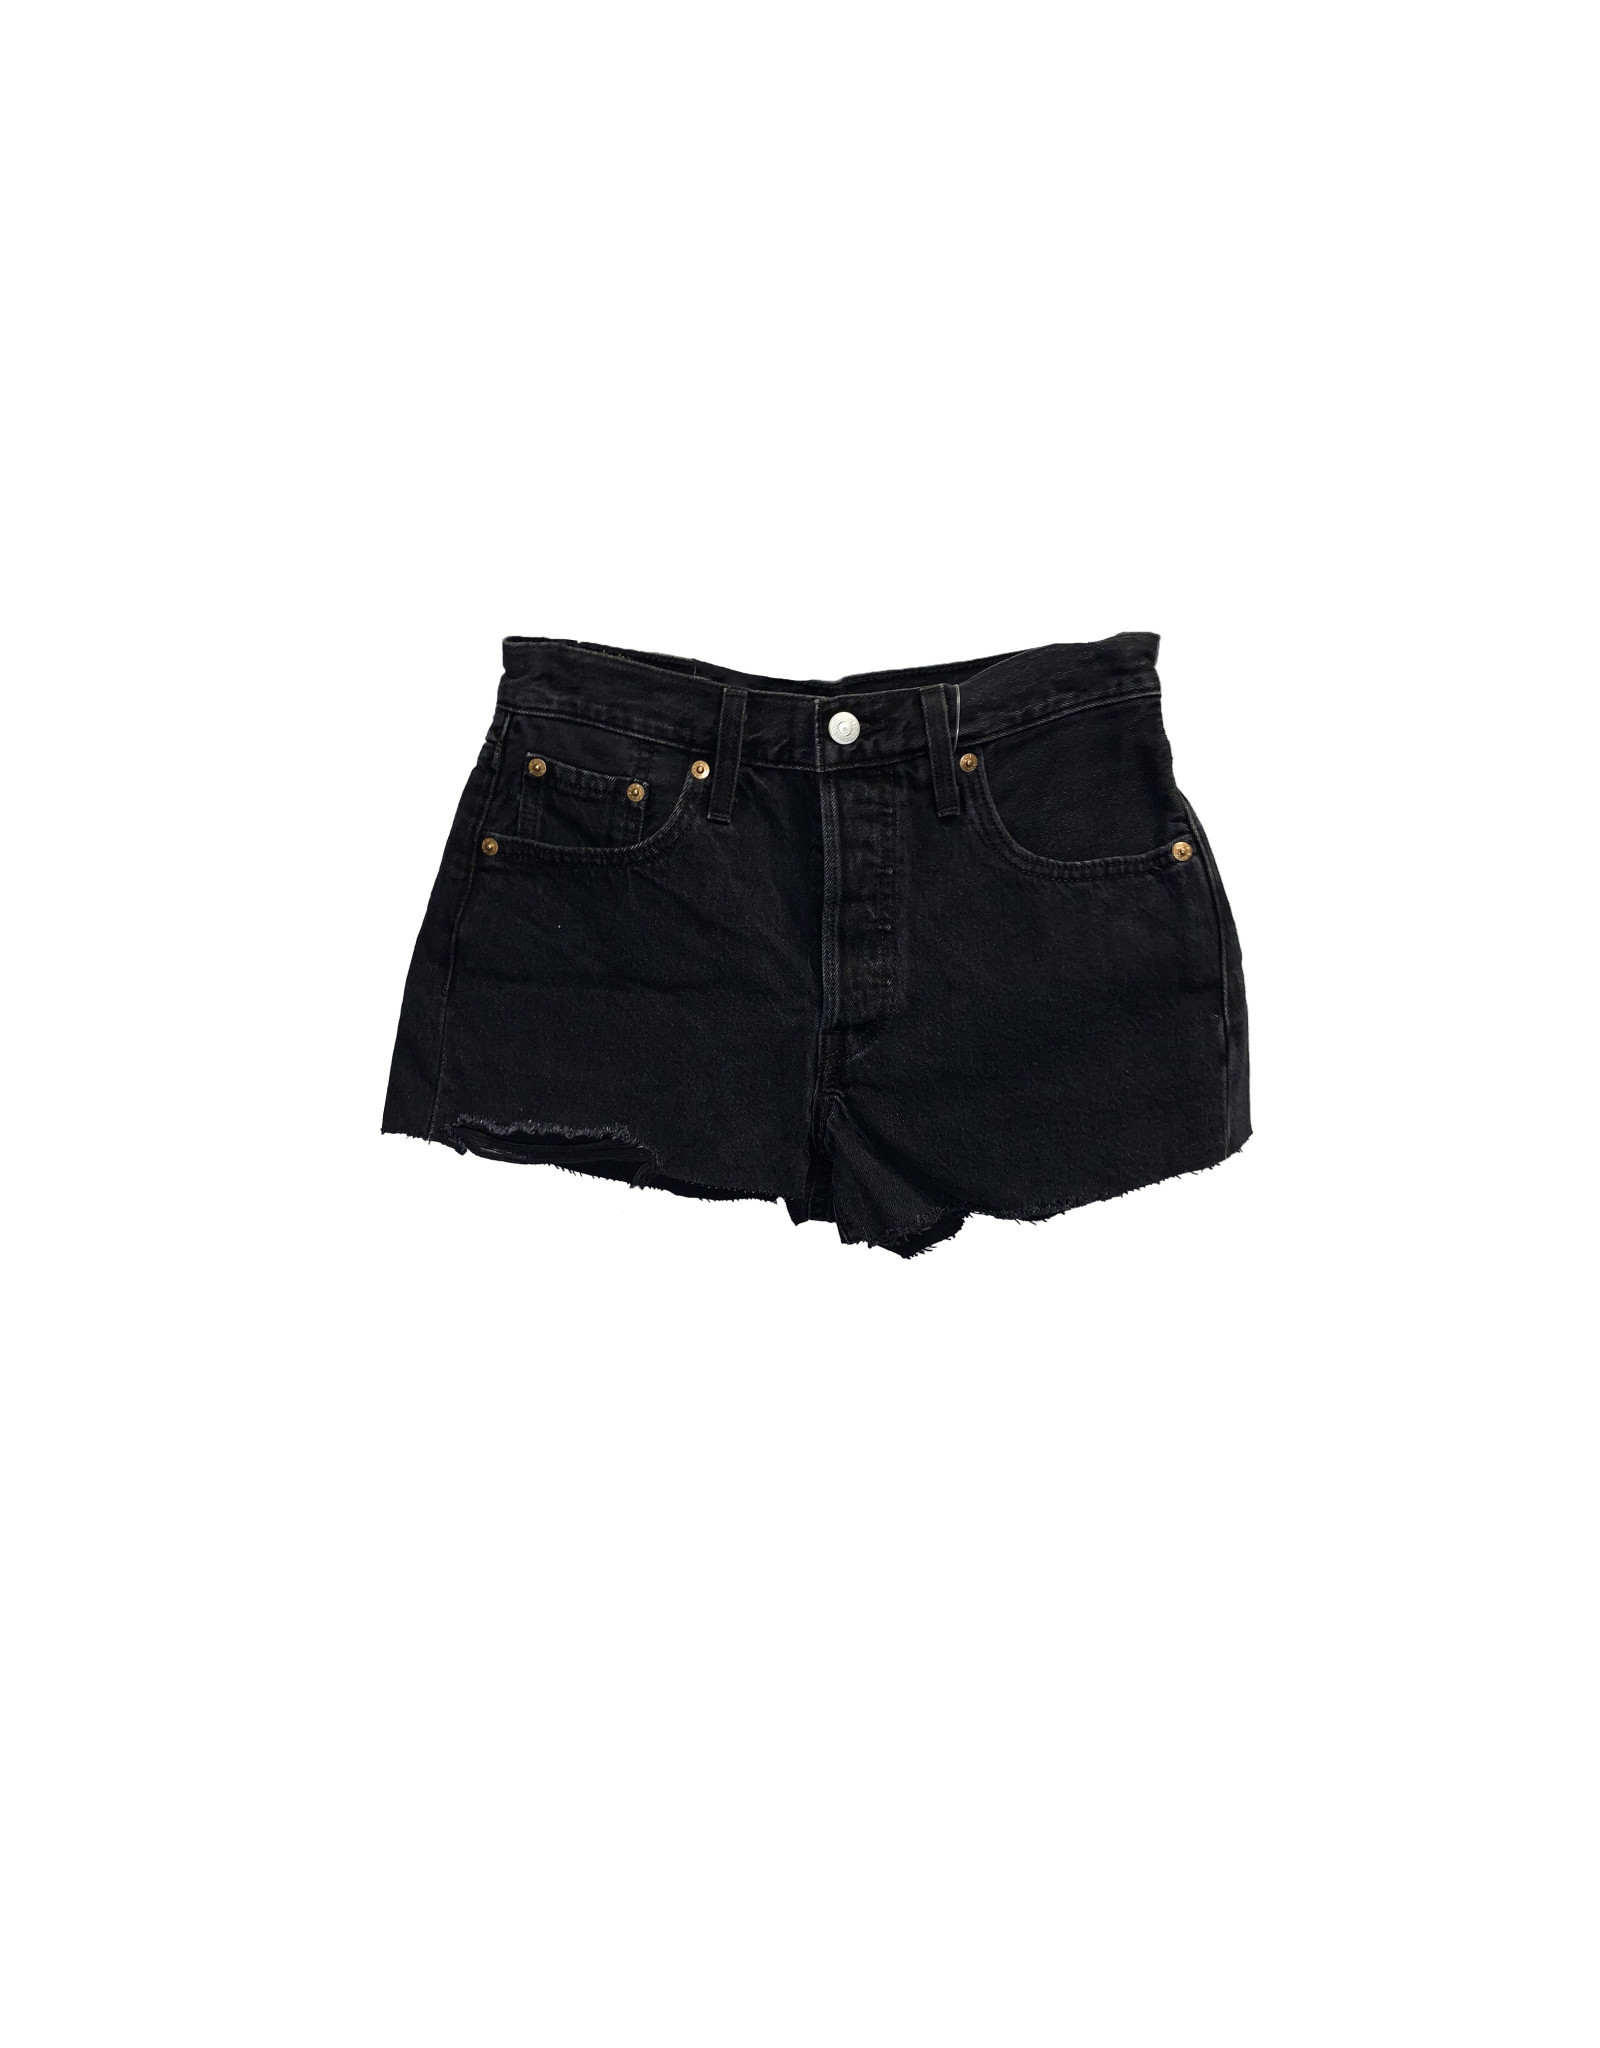 Levi's Levi's 501  Women's Shorts  Size 25